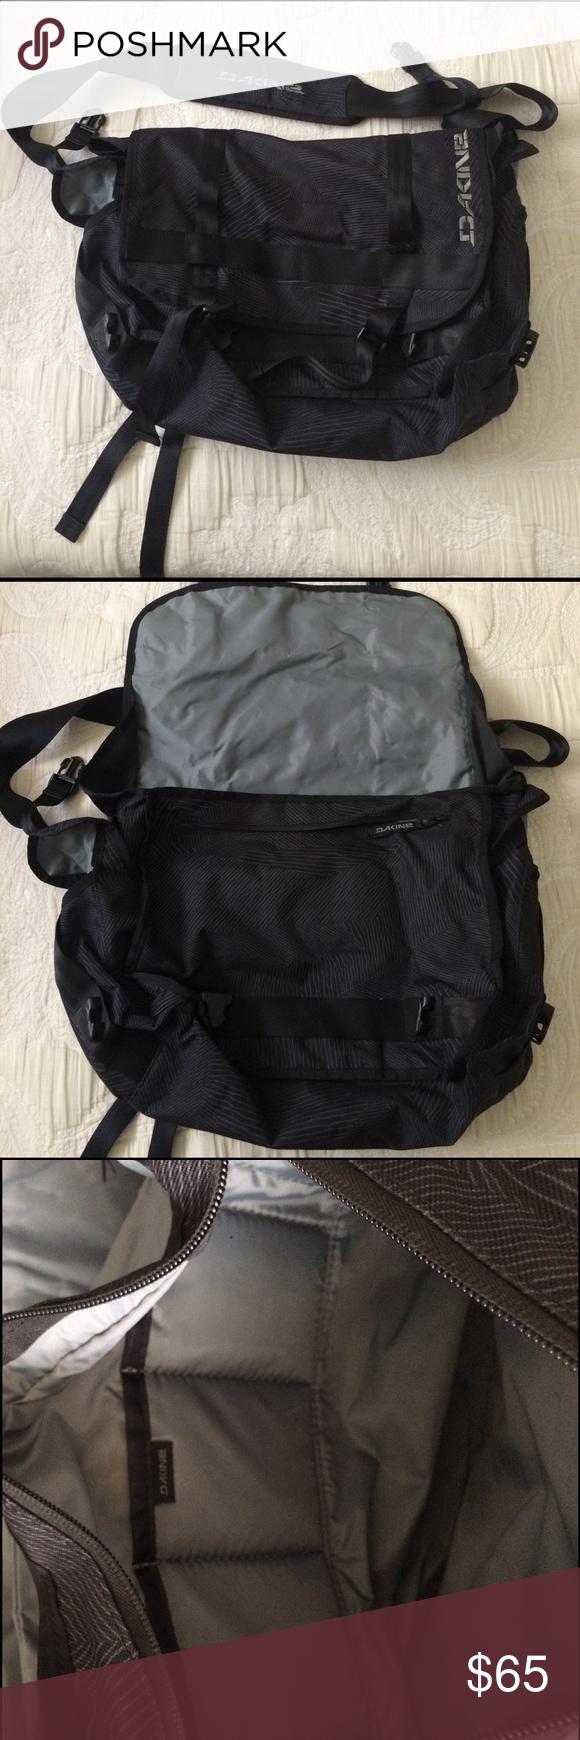 DaKine Canvas Messenger Bag DaKine Canvas Messenger Bag Dakine Bags Messenger Bags